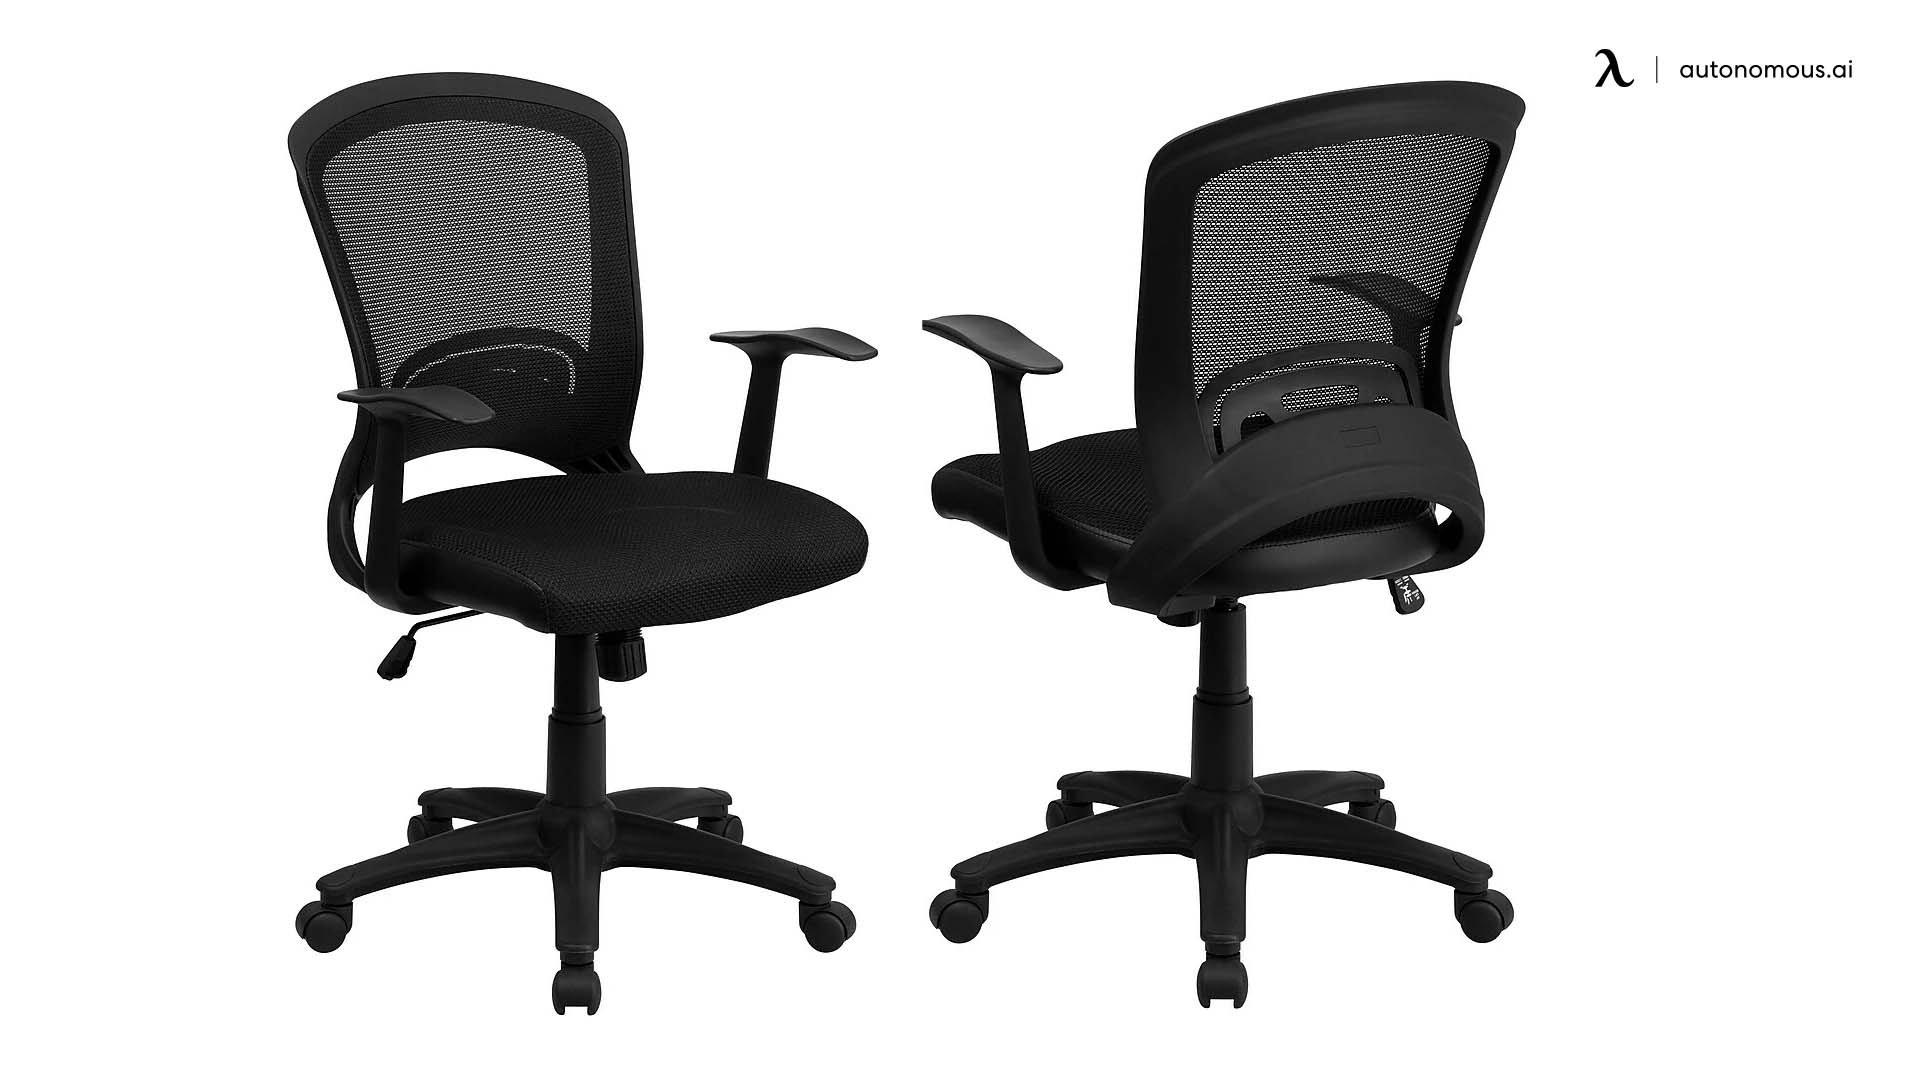 The Flash Furniture desk chair